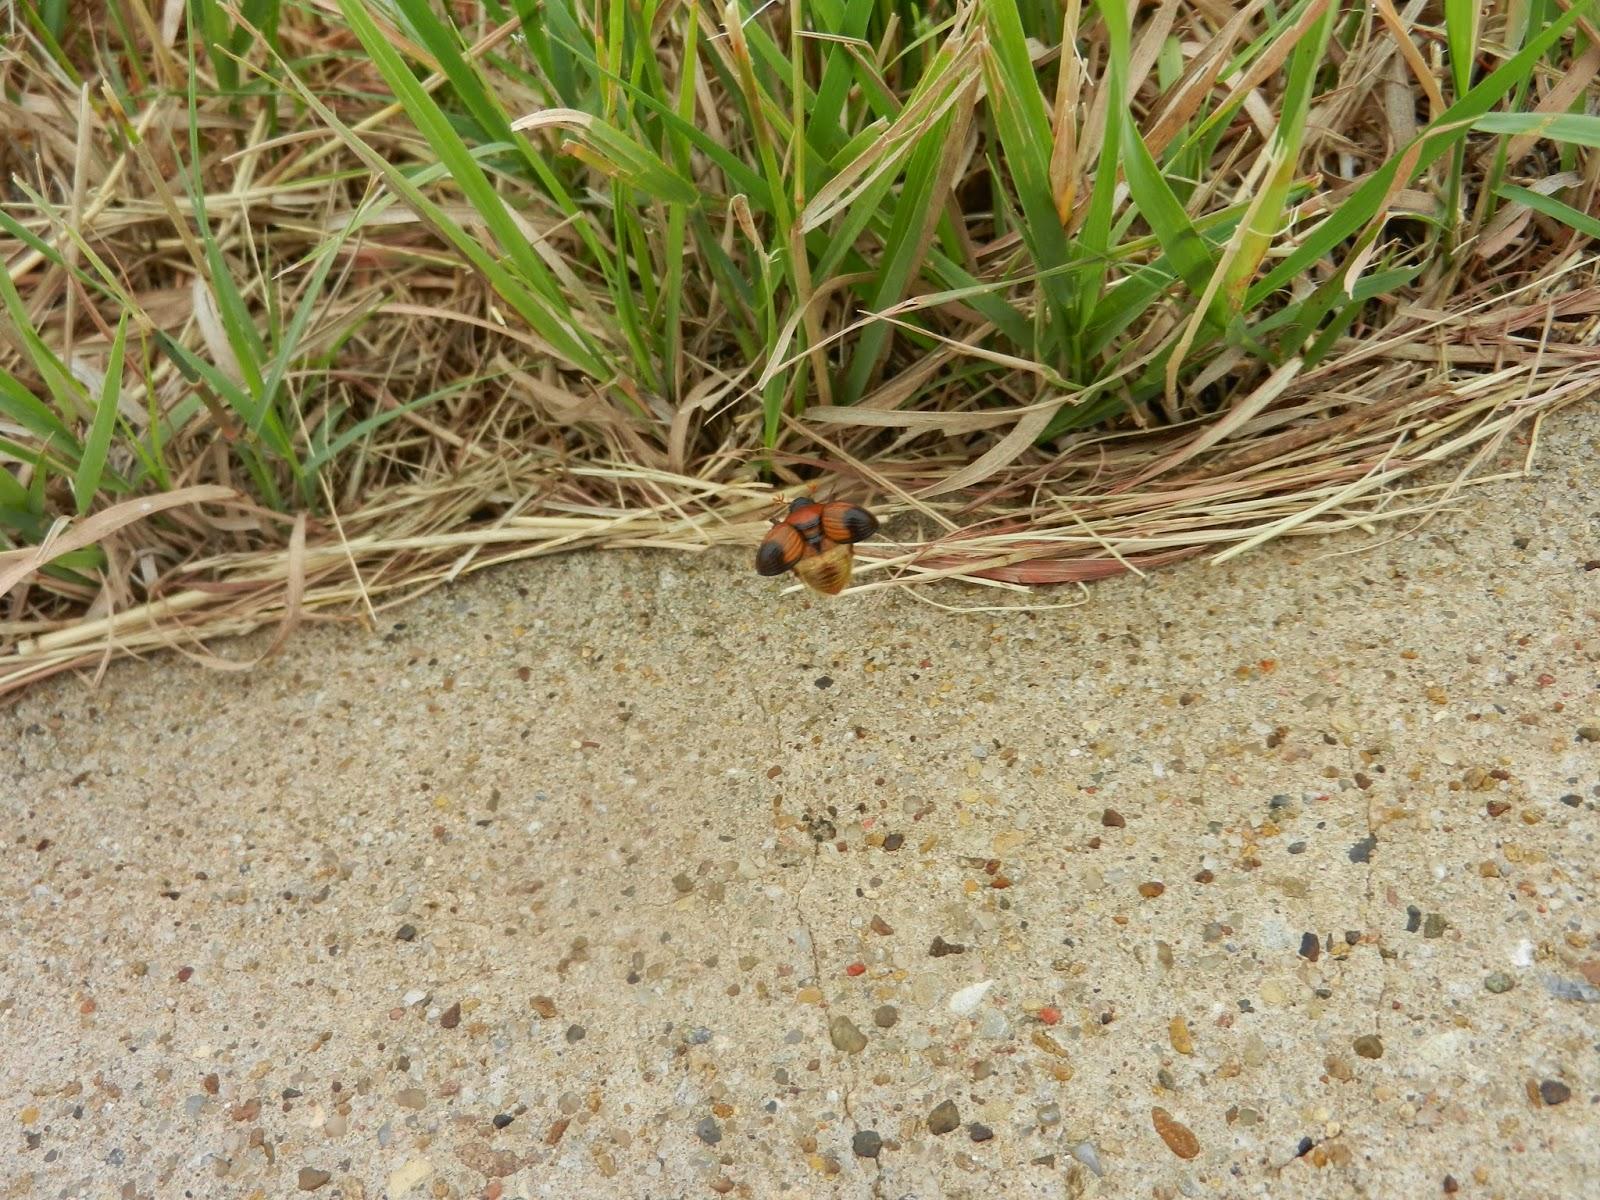 texas field beetle